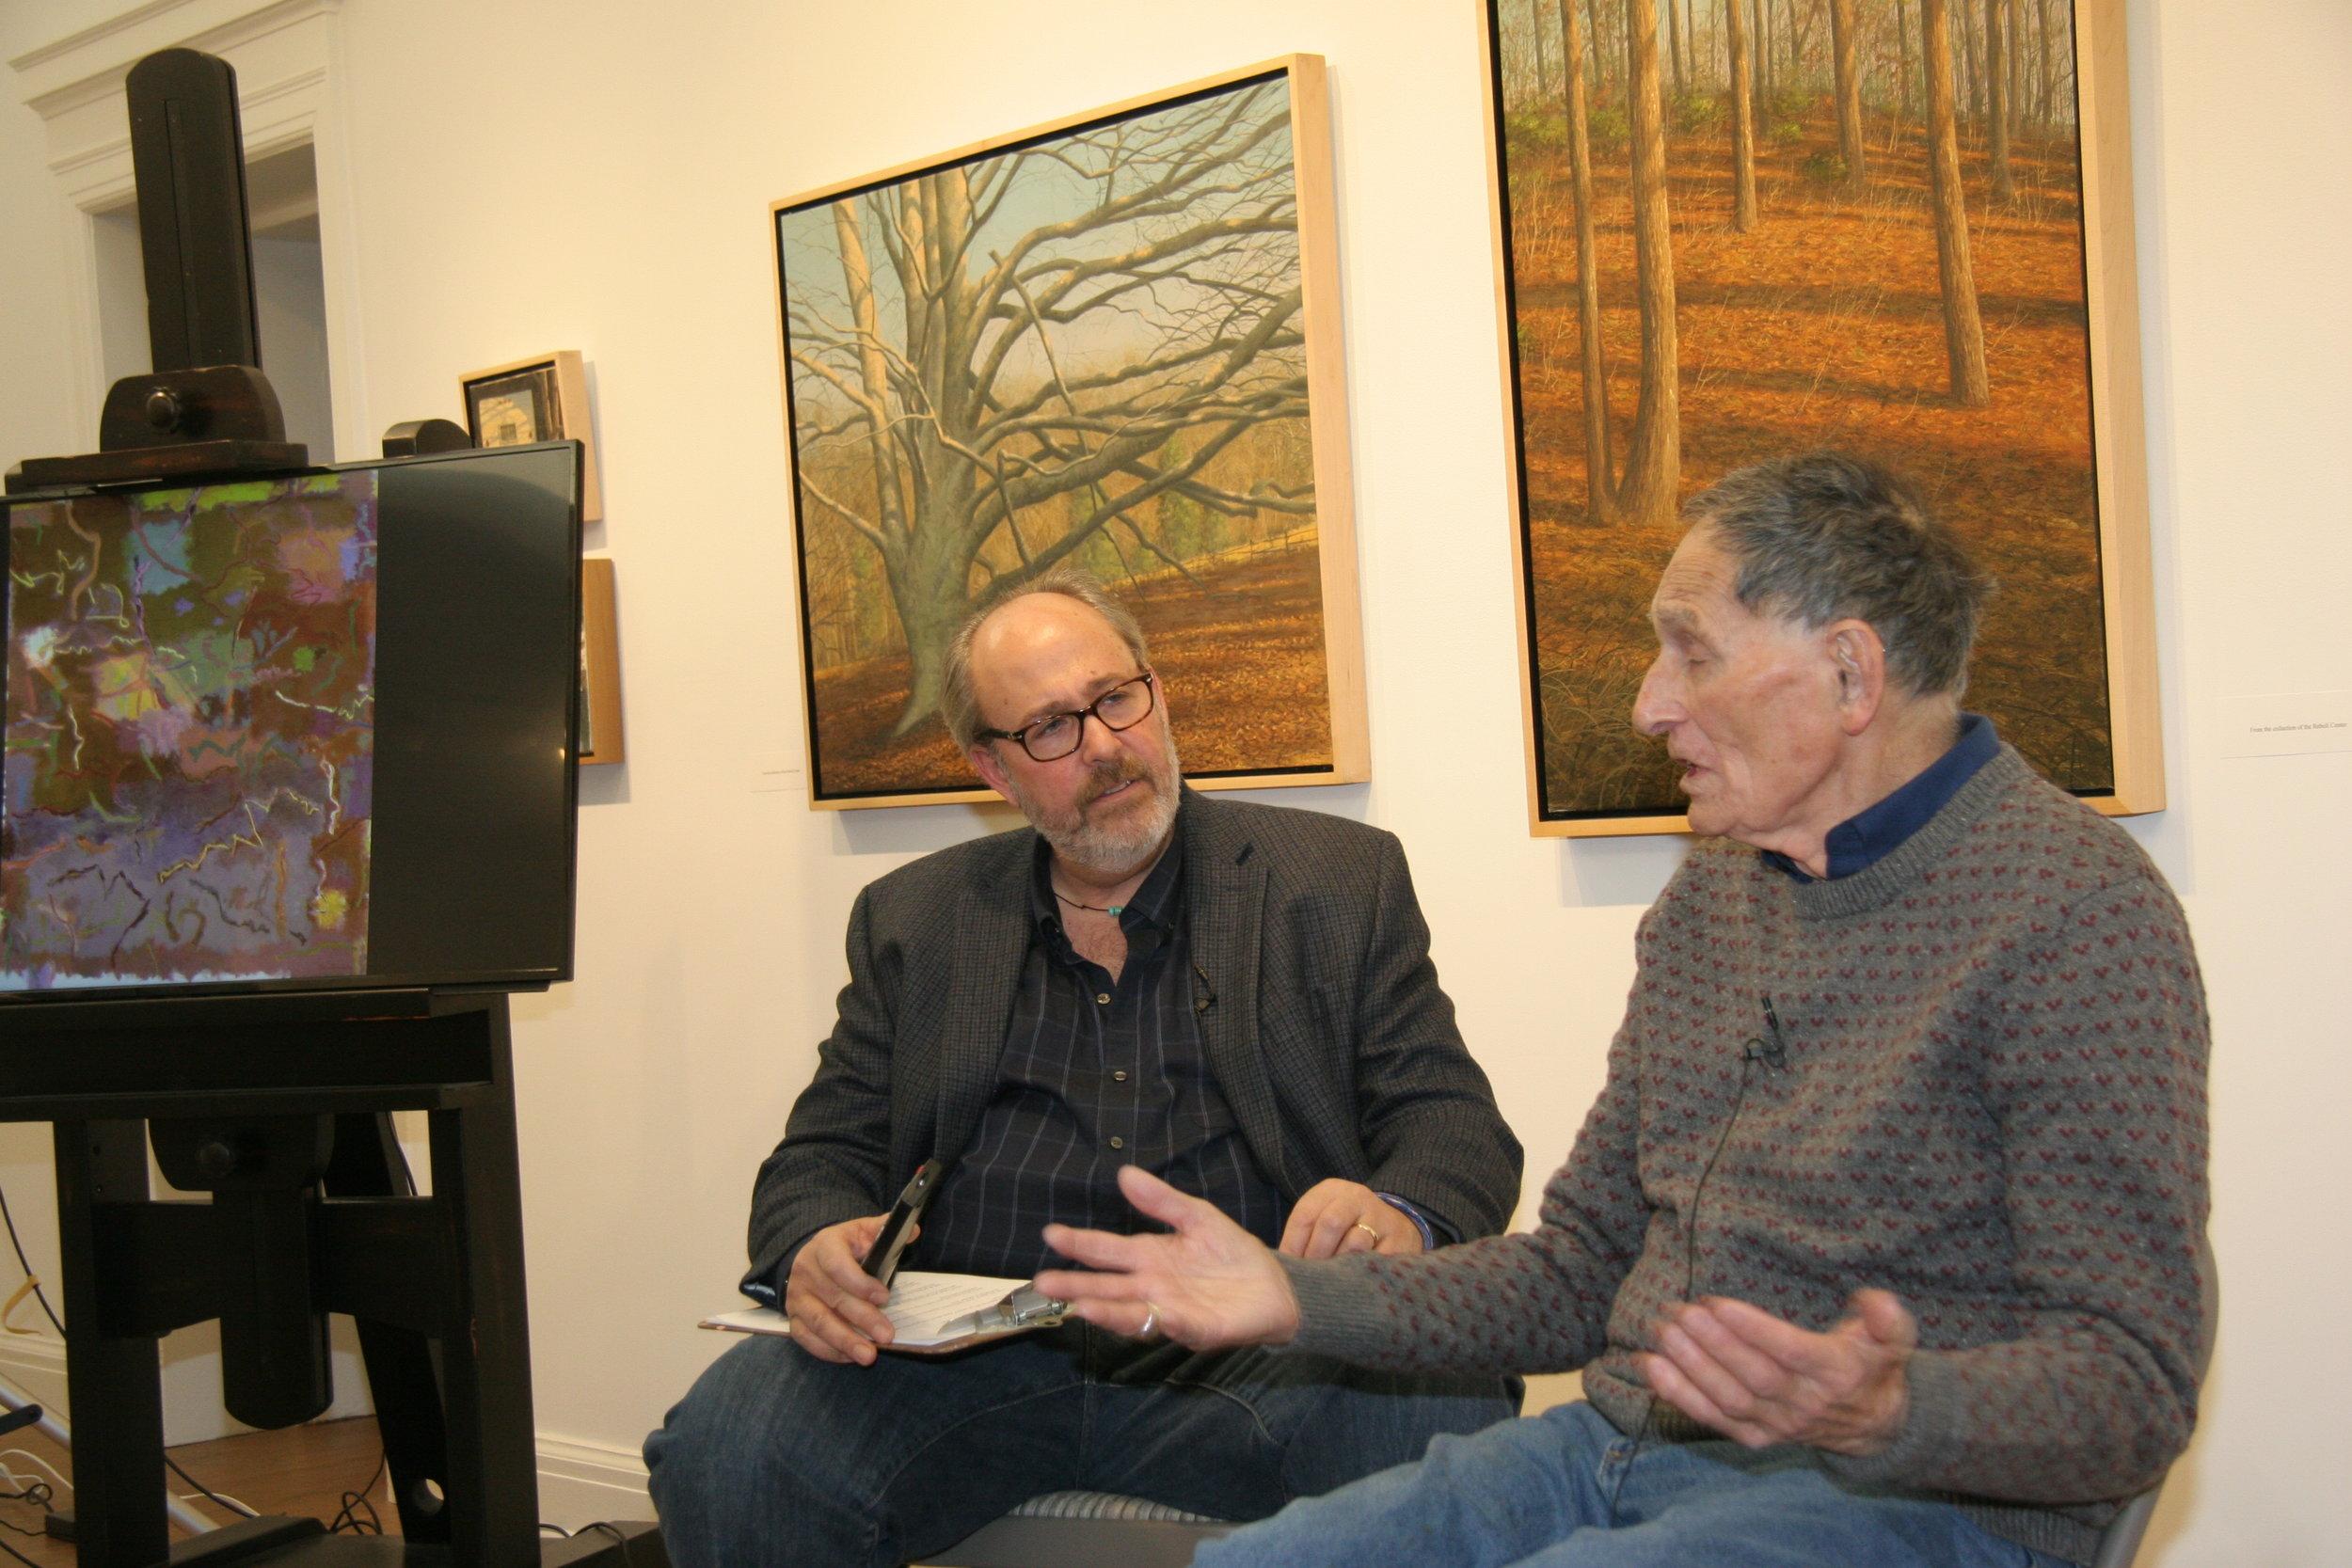 Doug Reina with Stan Brodsky